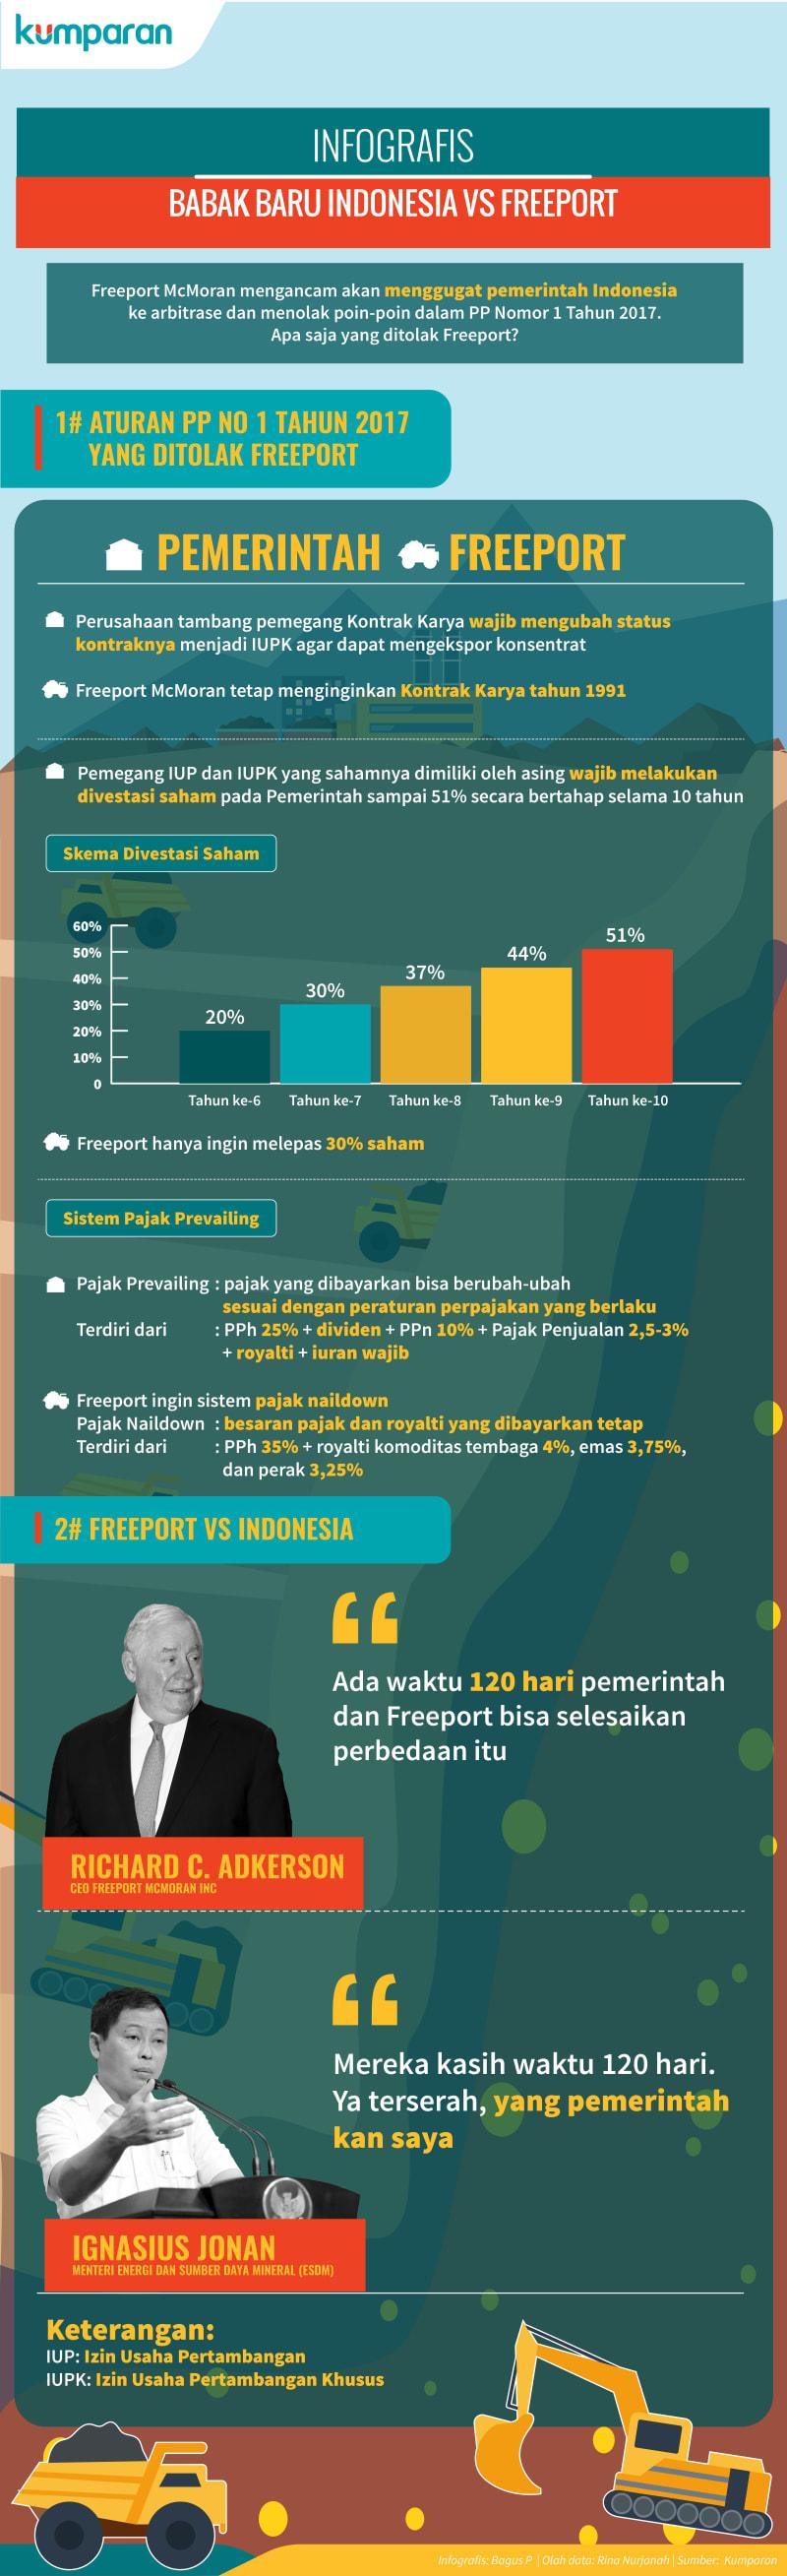 Infografis Babak Baru Indonesia dan Freeport